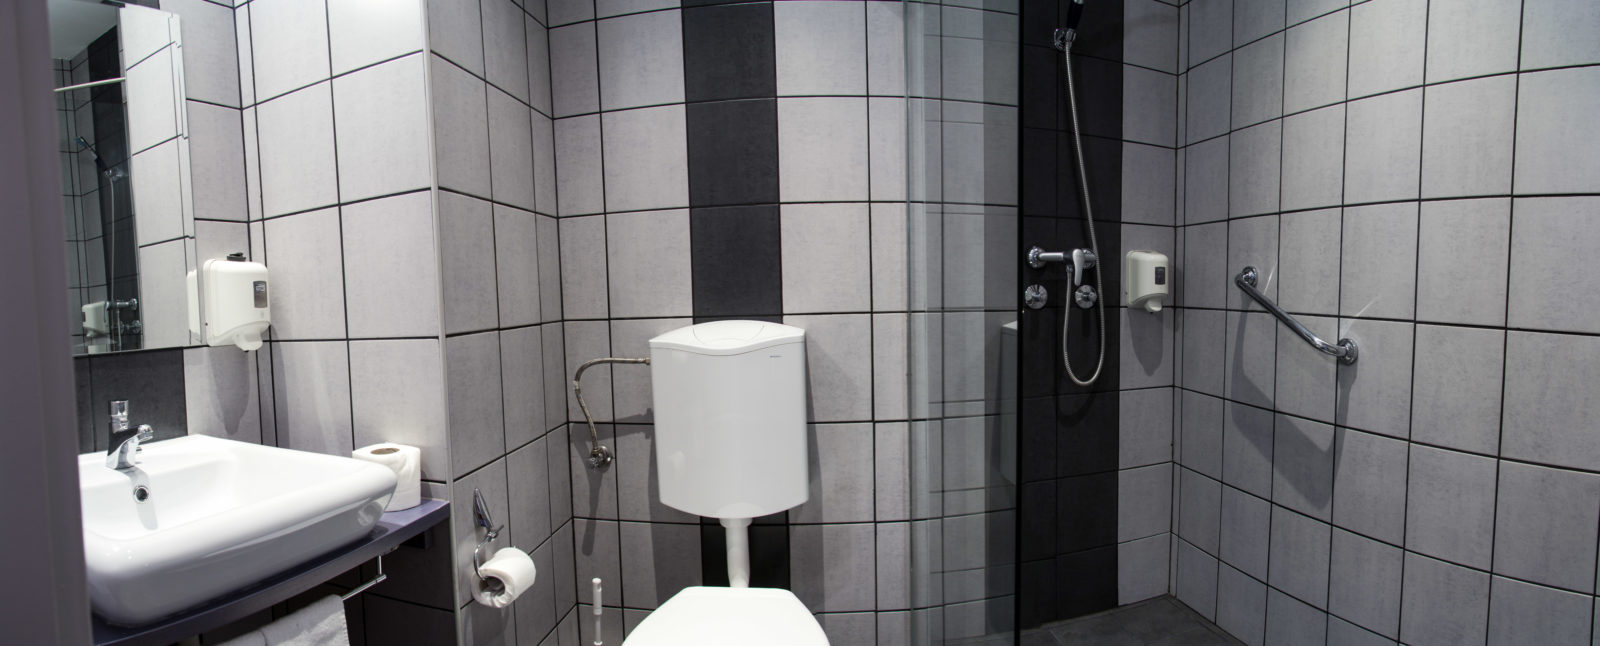 Berlin_bathroom-1600x646